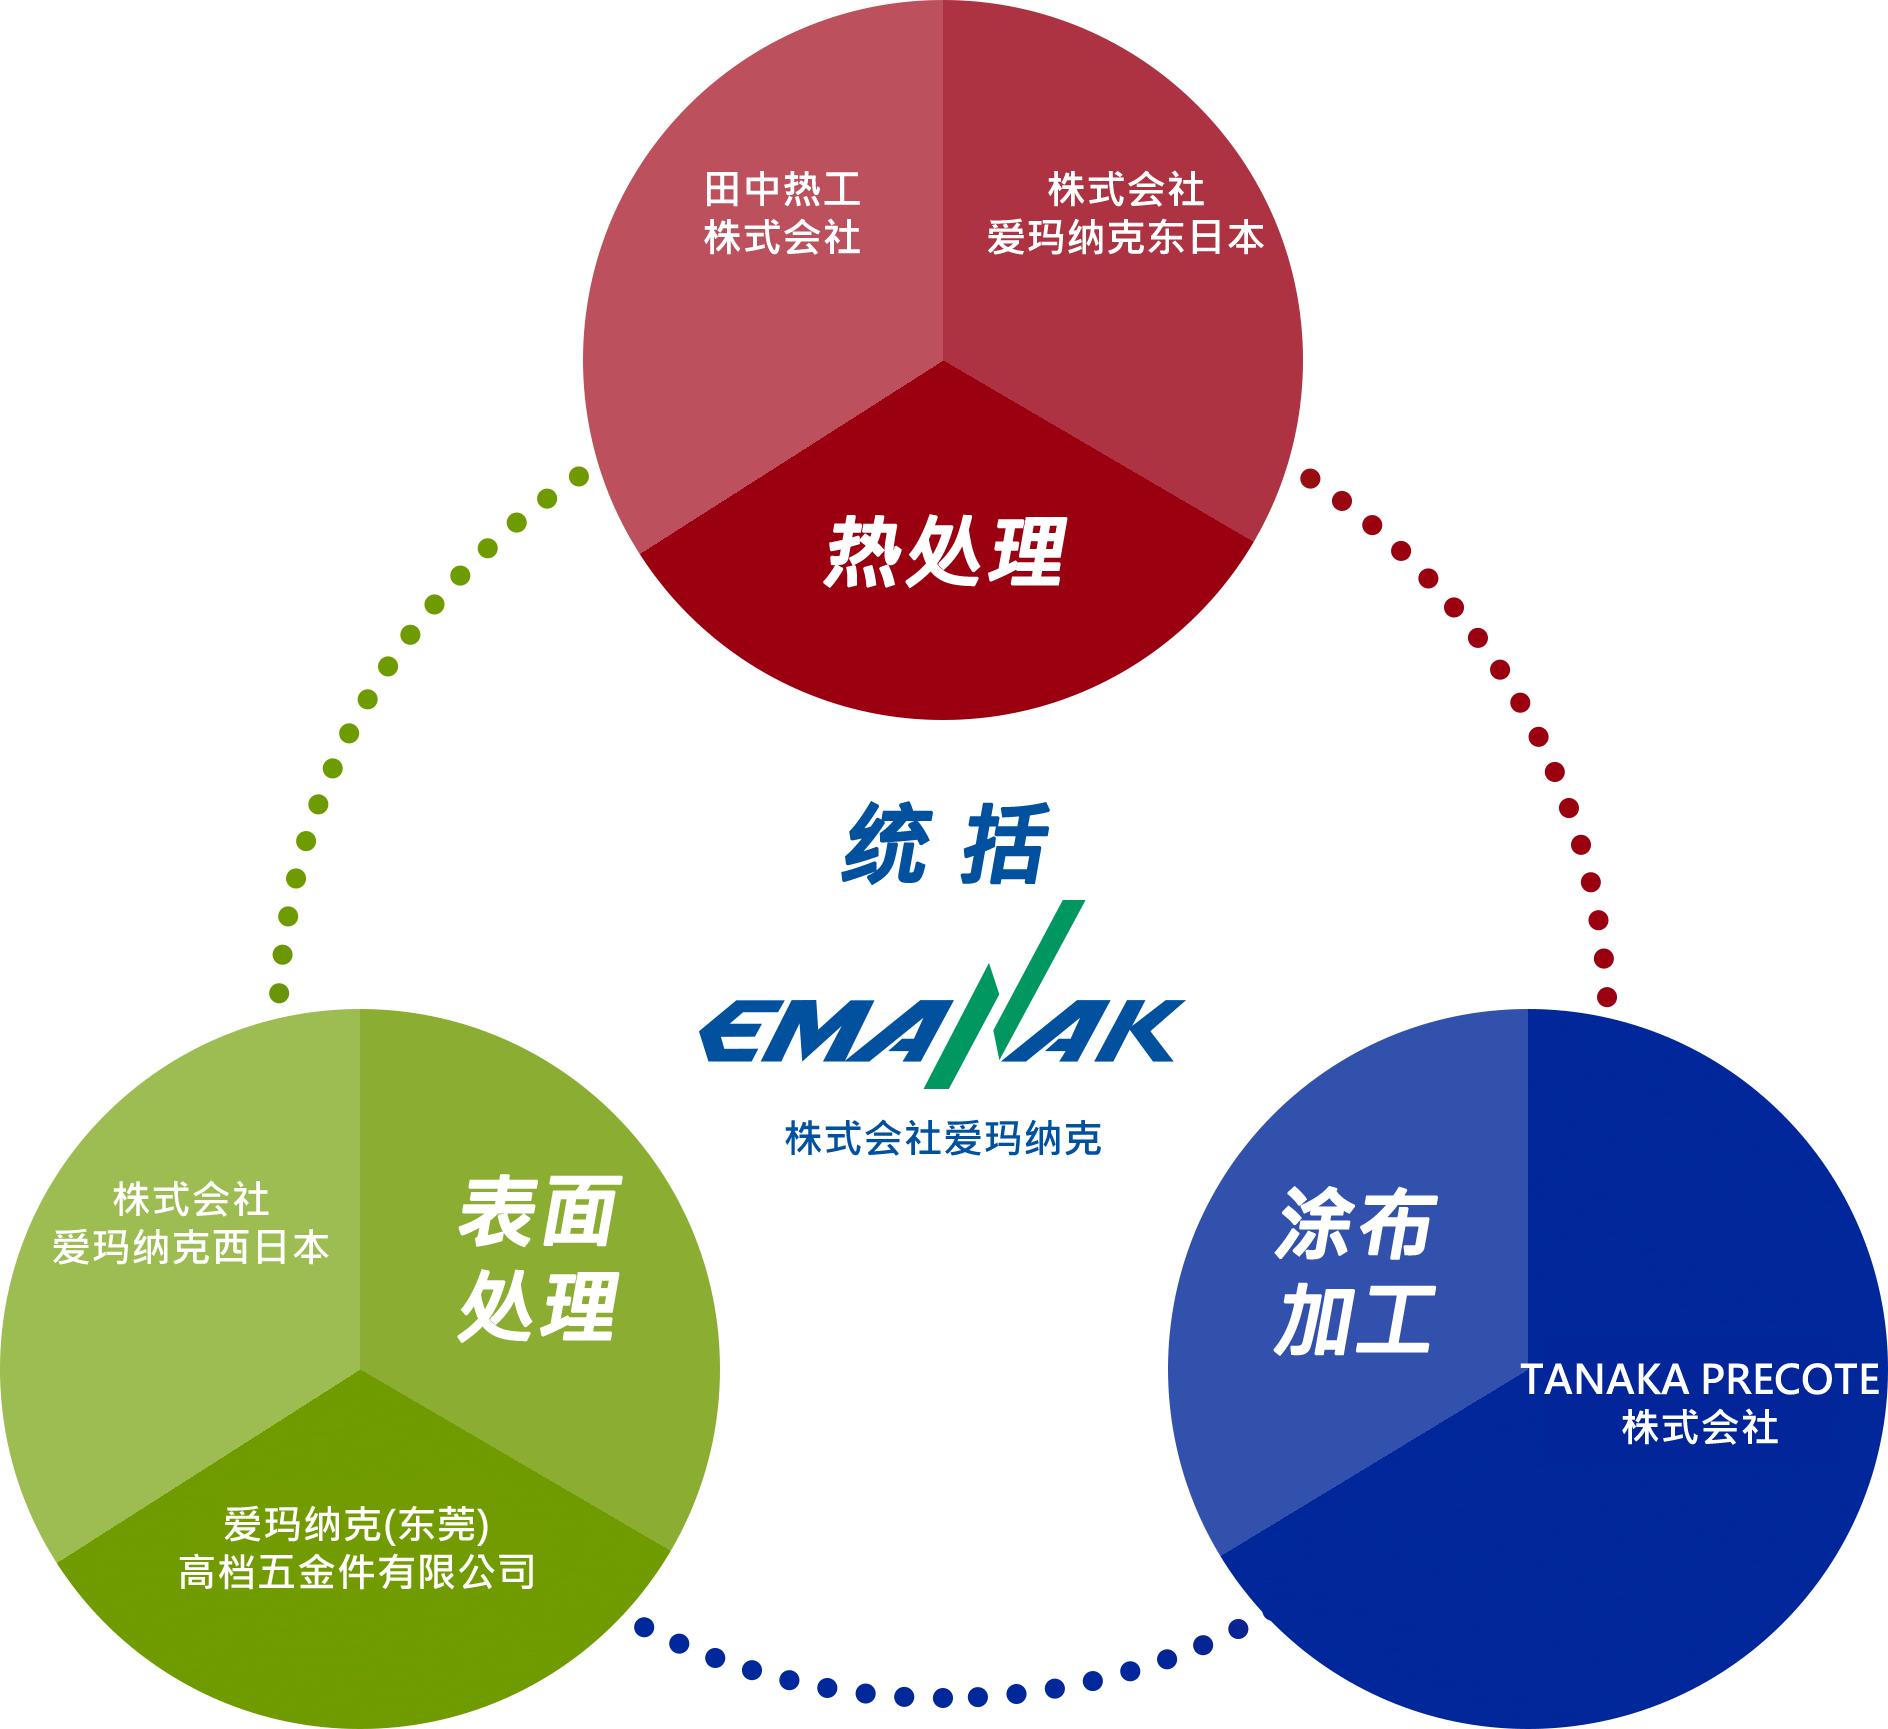 Emanac集团的结构,用于金属热处理,表面处理和涂层